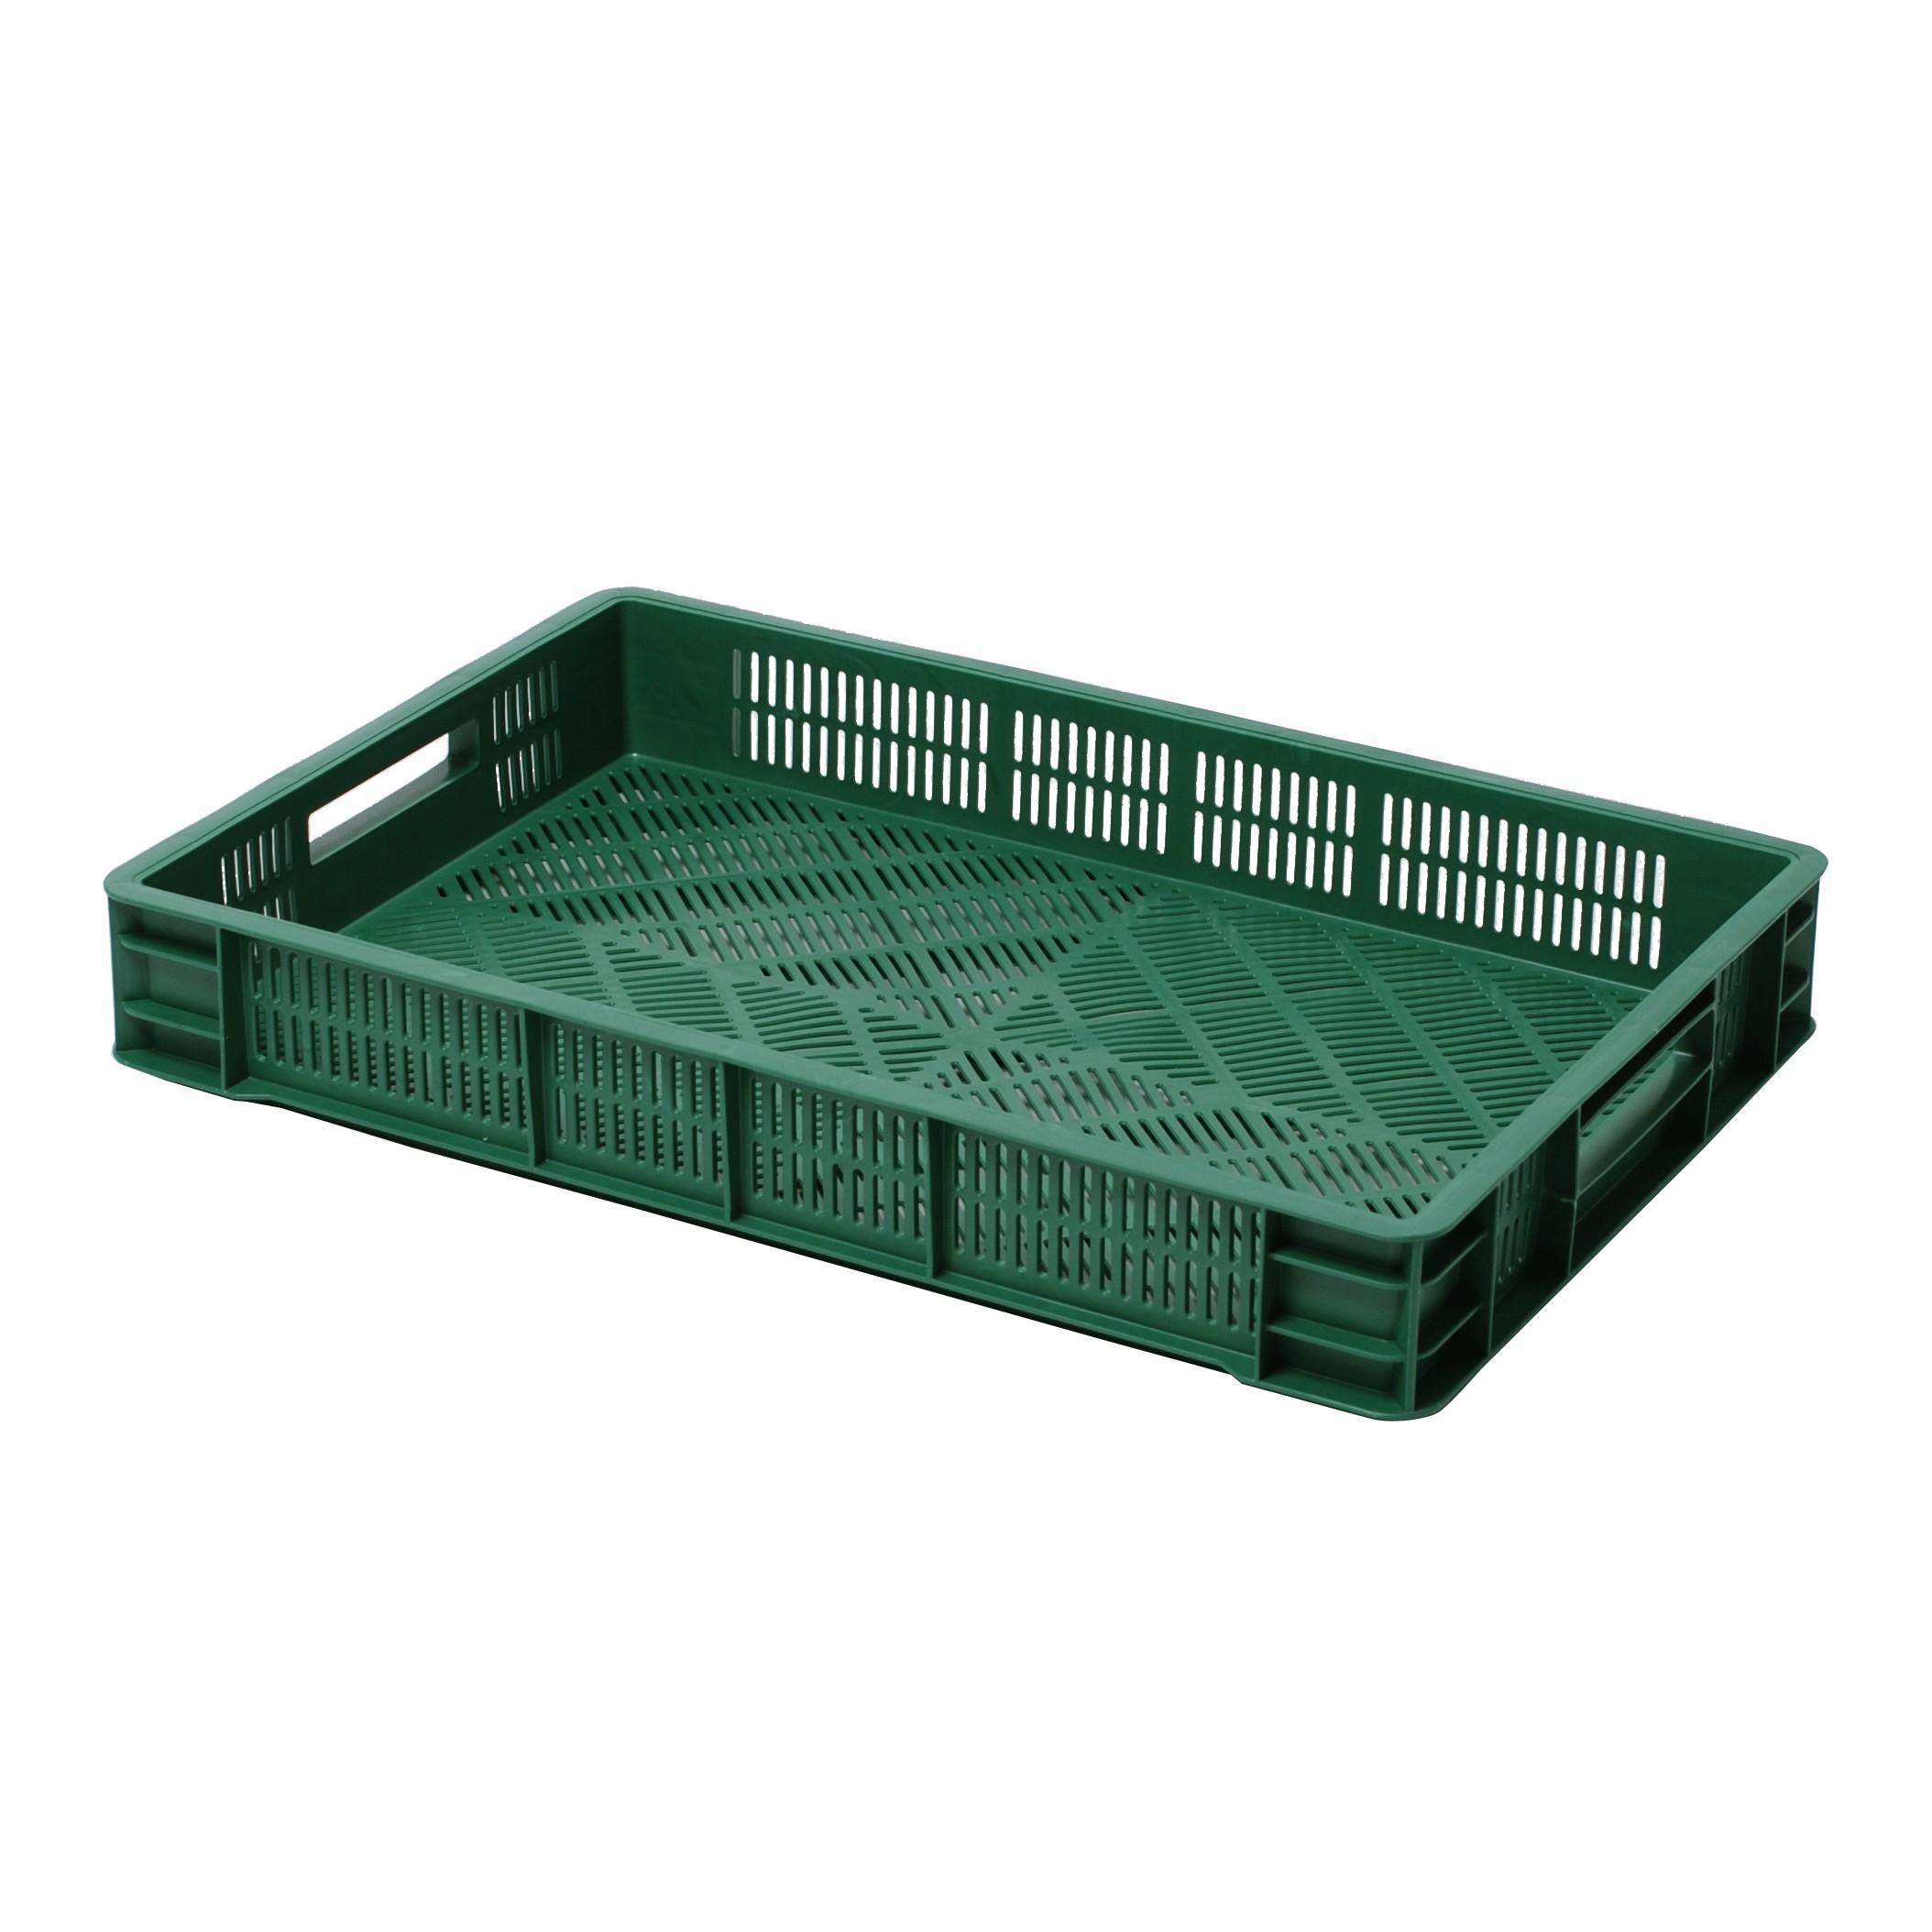 nízka prepravka plastová nádoba na ovocie 600x400x90mm zelená perforovaná megamix.sk